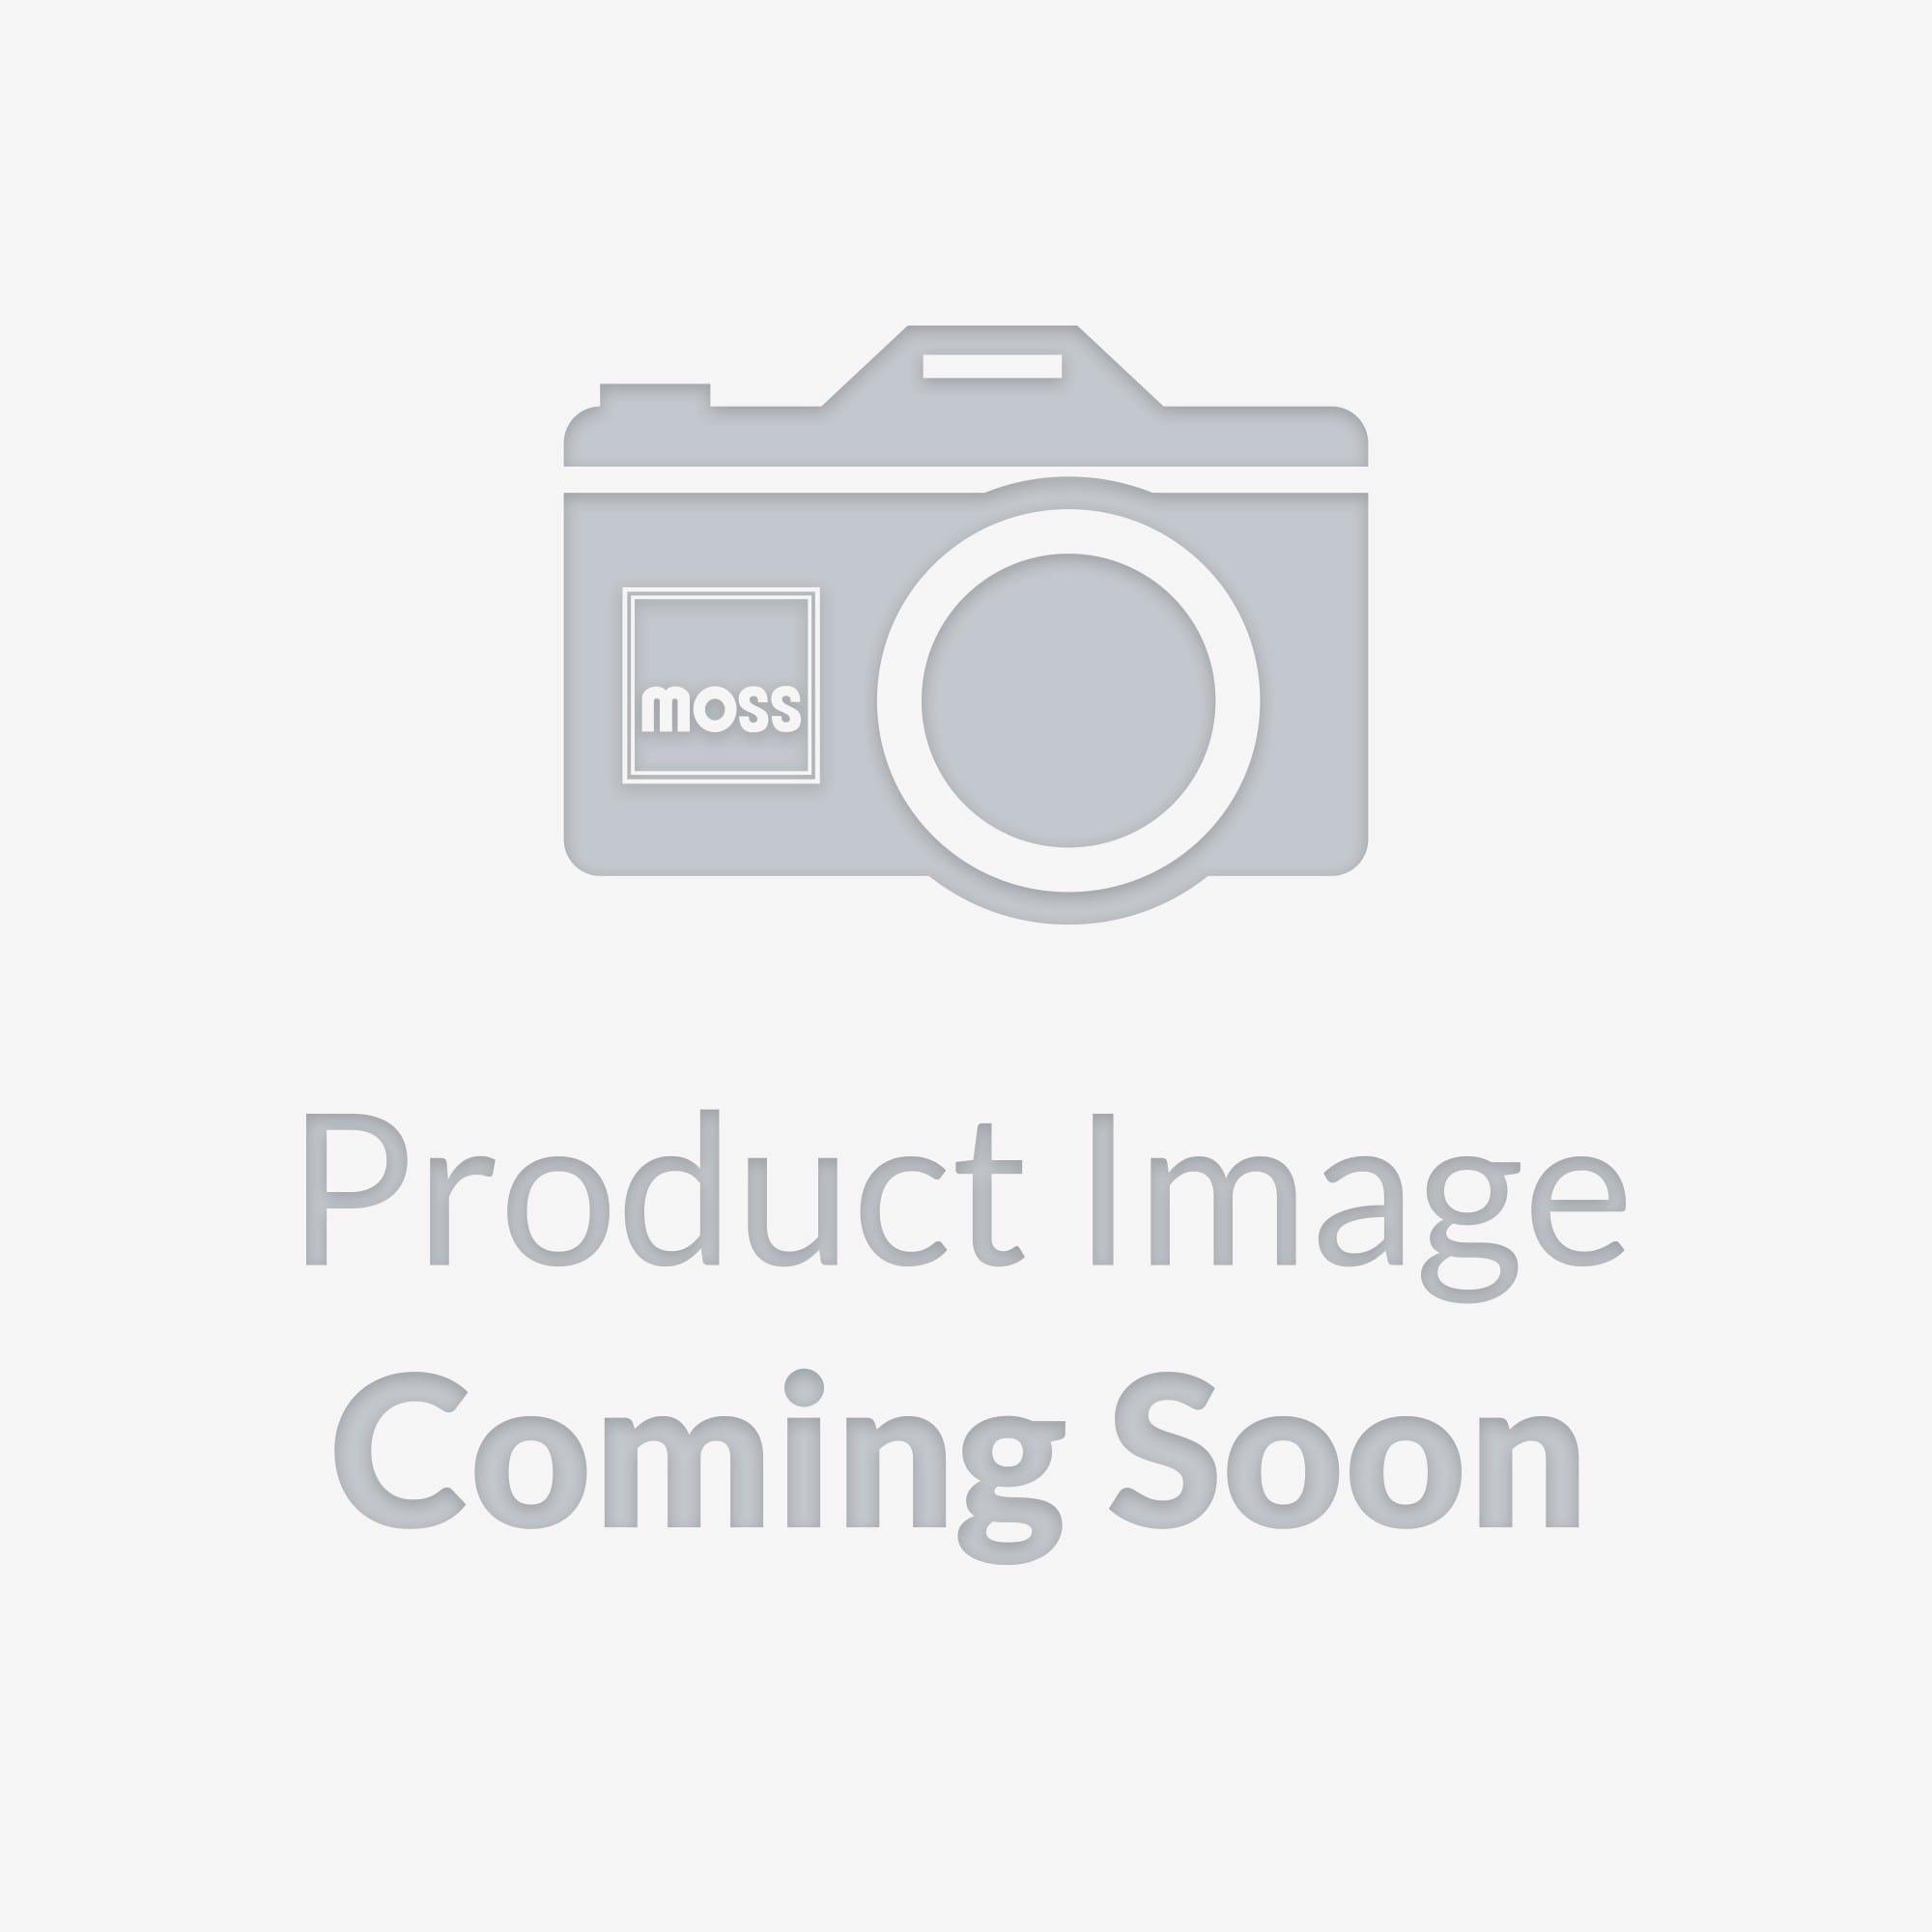 633-320 GLOVE BOX LOCK, chrome, with 2 keys | Moss Motors